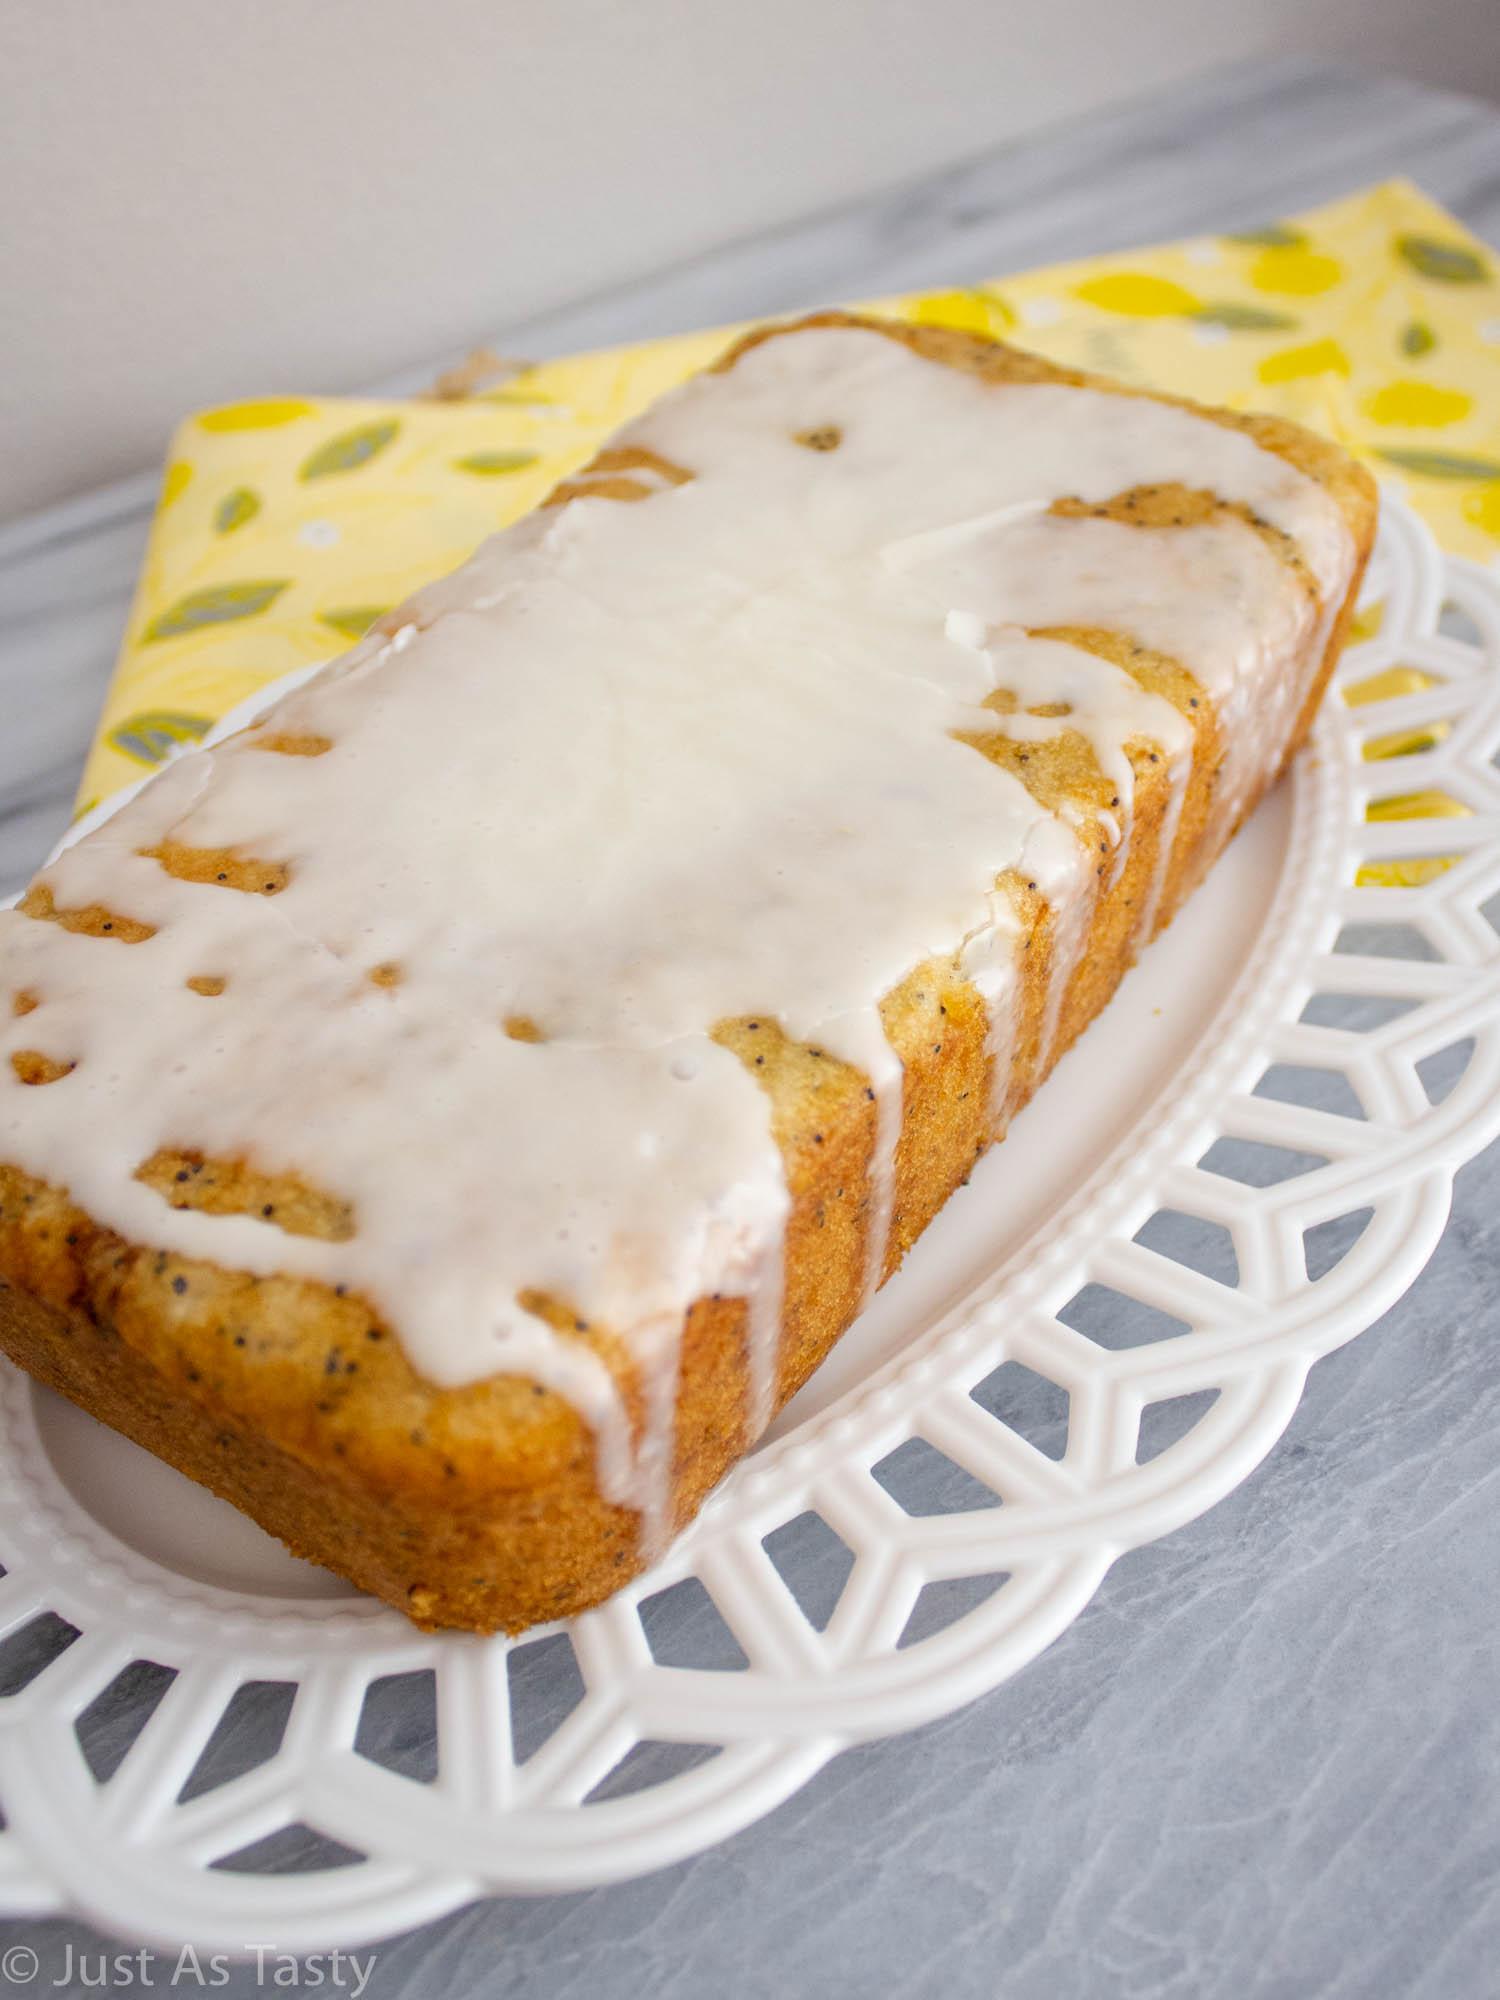 Gluten free lemon poppy seed loaf with a glaze on top.